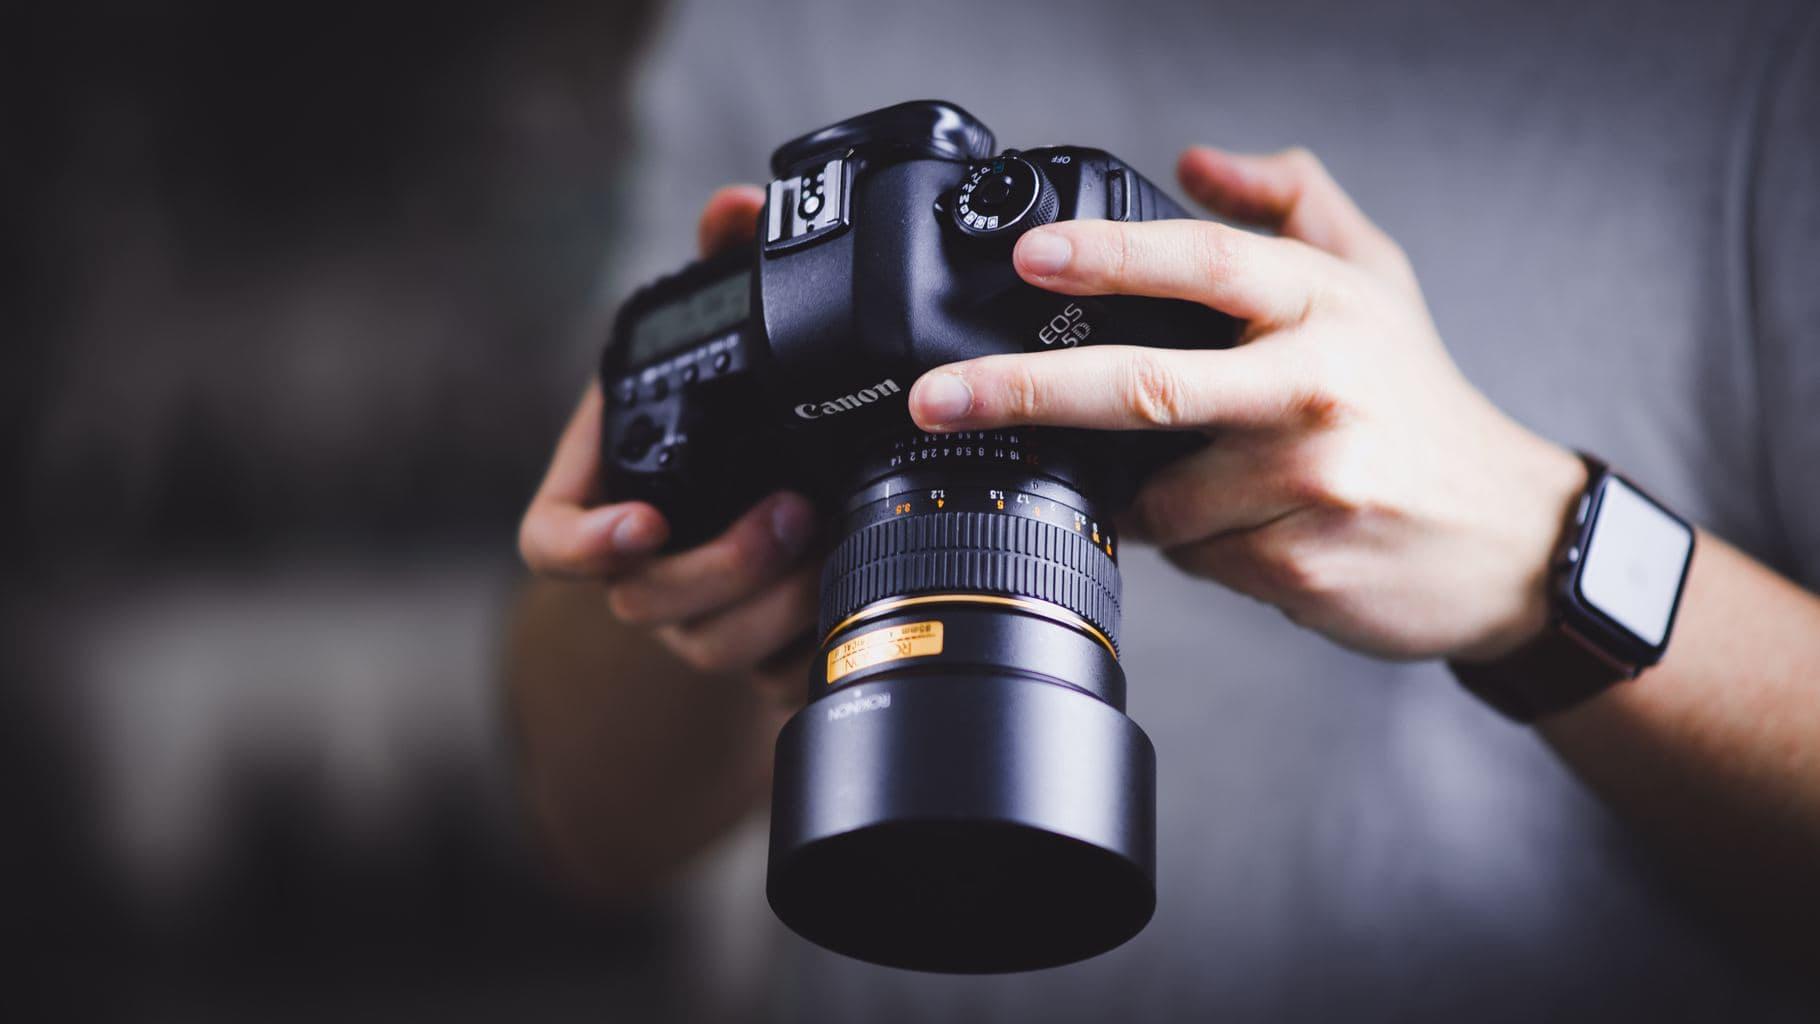 cámara réflex manos